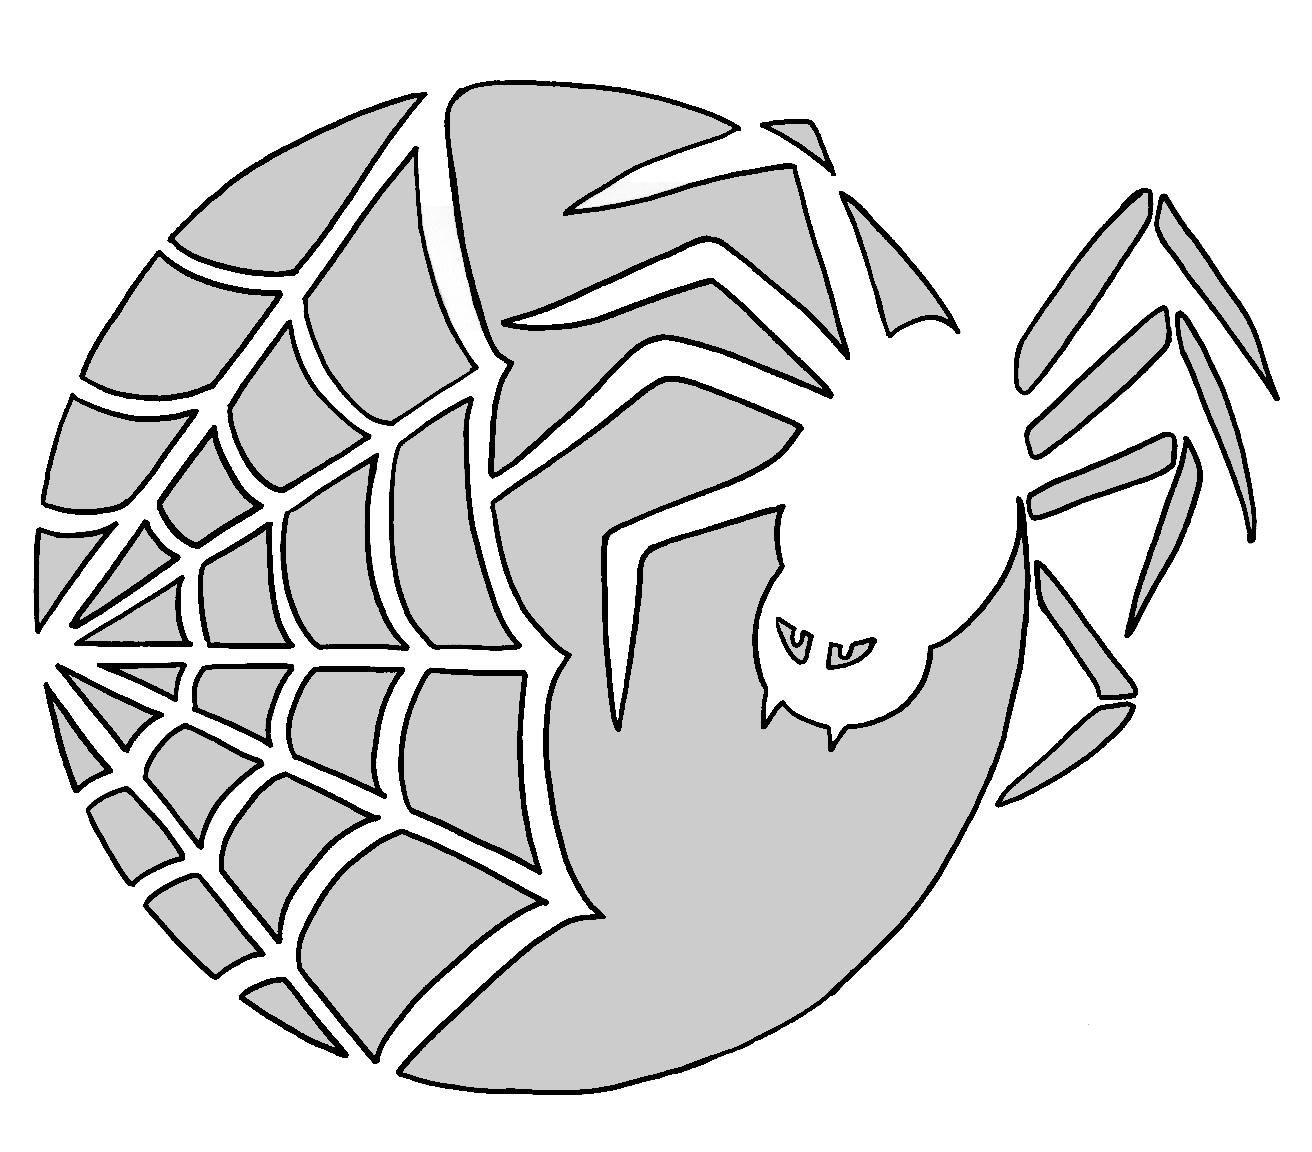 Spider Web Pattern   Spider Man Party In 2019   Pumpkin Carving - Spider Web Stencil Free Printable